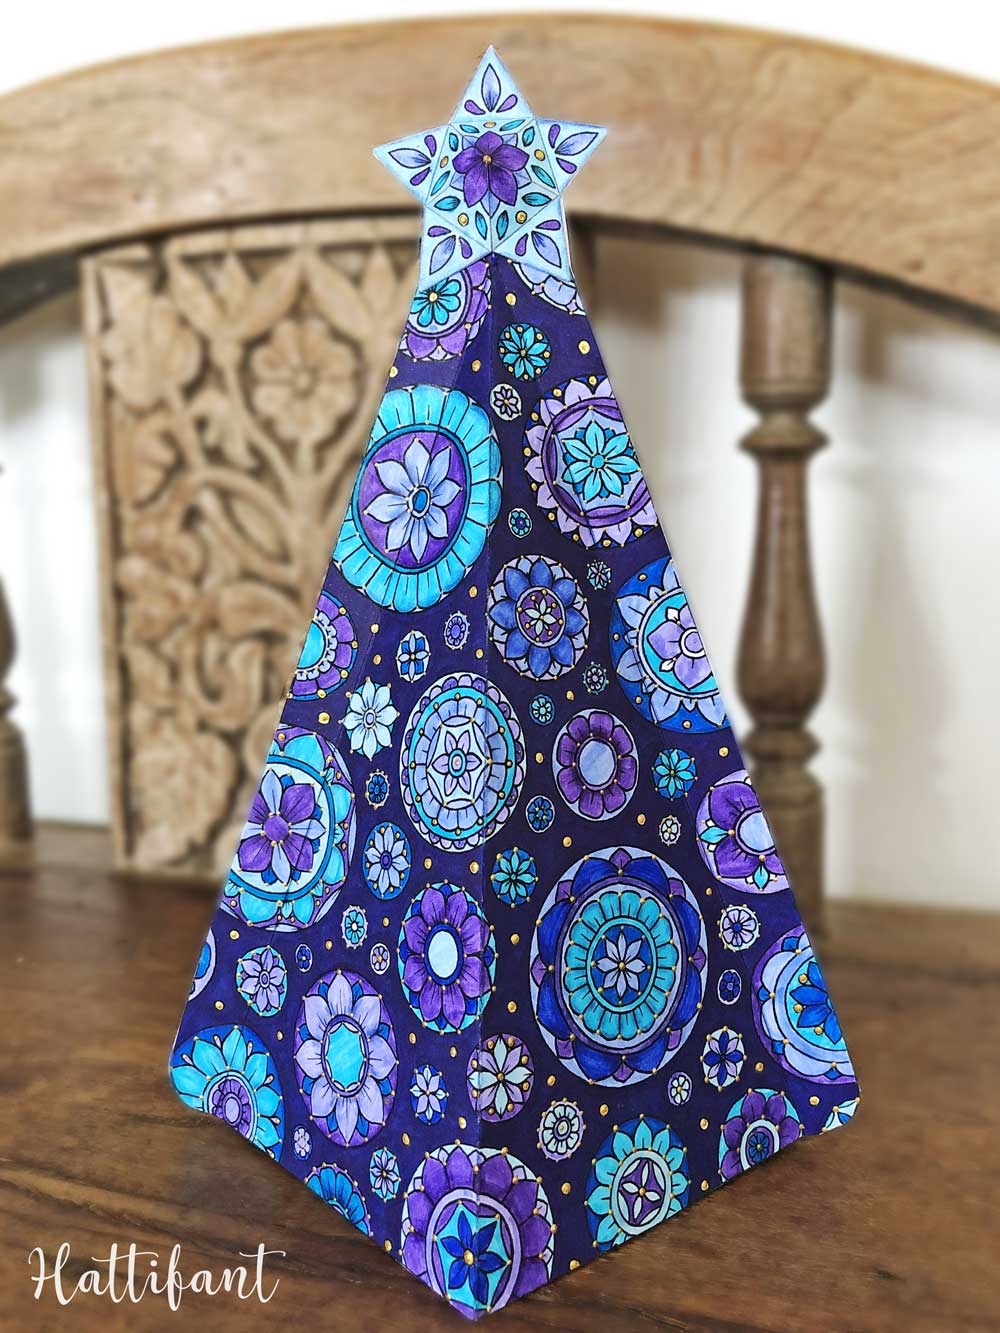 Hattifant's 3D Mandala Christmas Tree Ensemble to Color